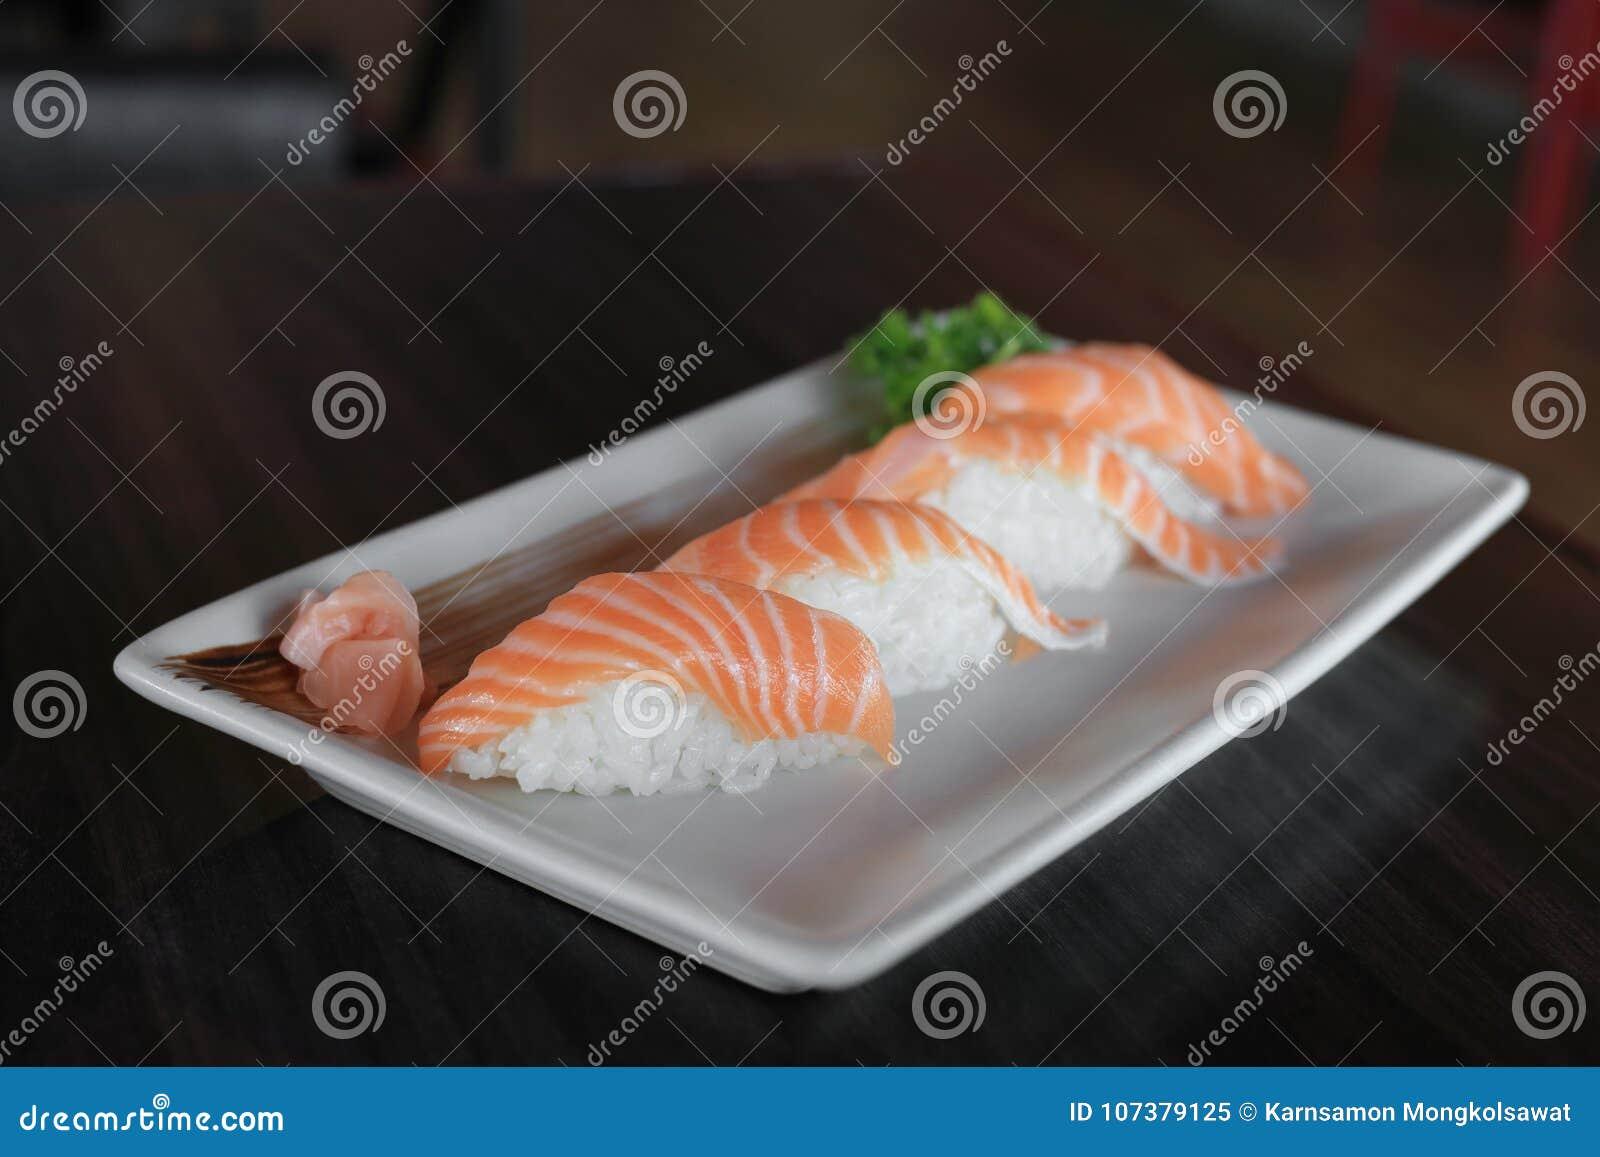 Raw salmon nigiri sushi dish japanese food recipe stock image download raw salmon nigiri sushi dish japanese food recipe stock image image of plate forumfinder Images